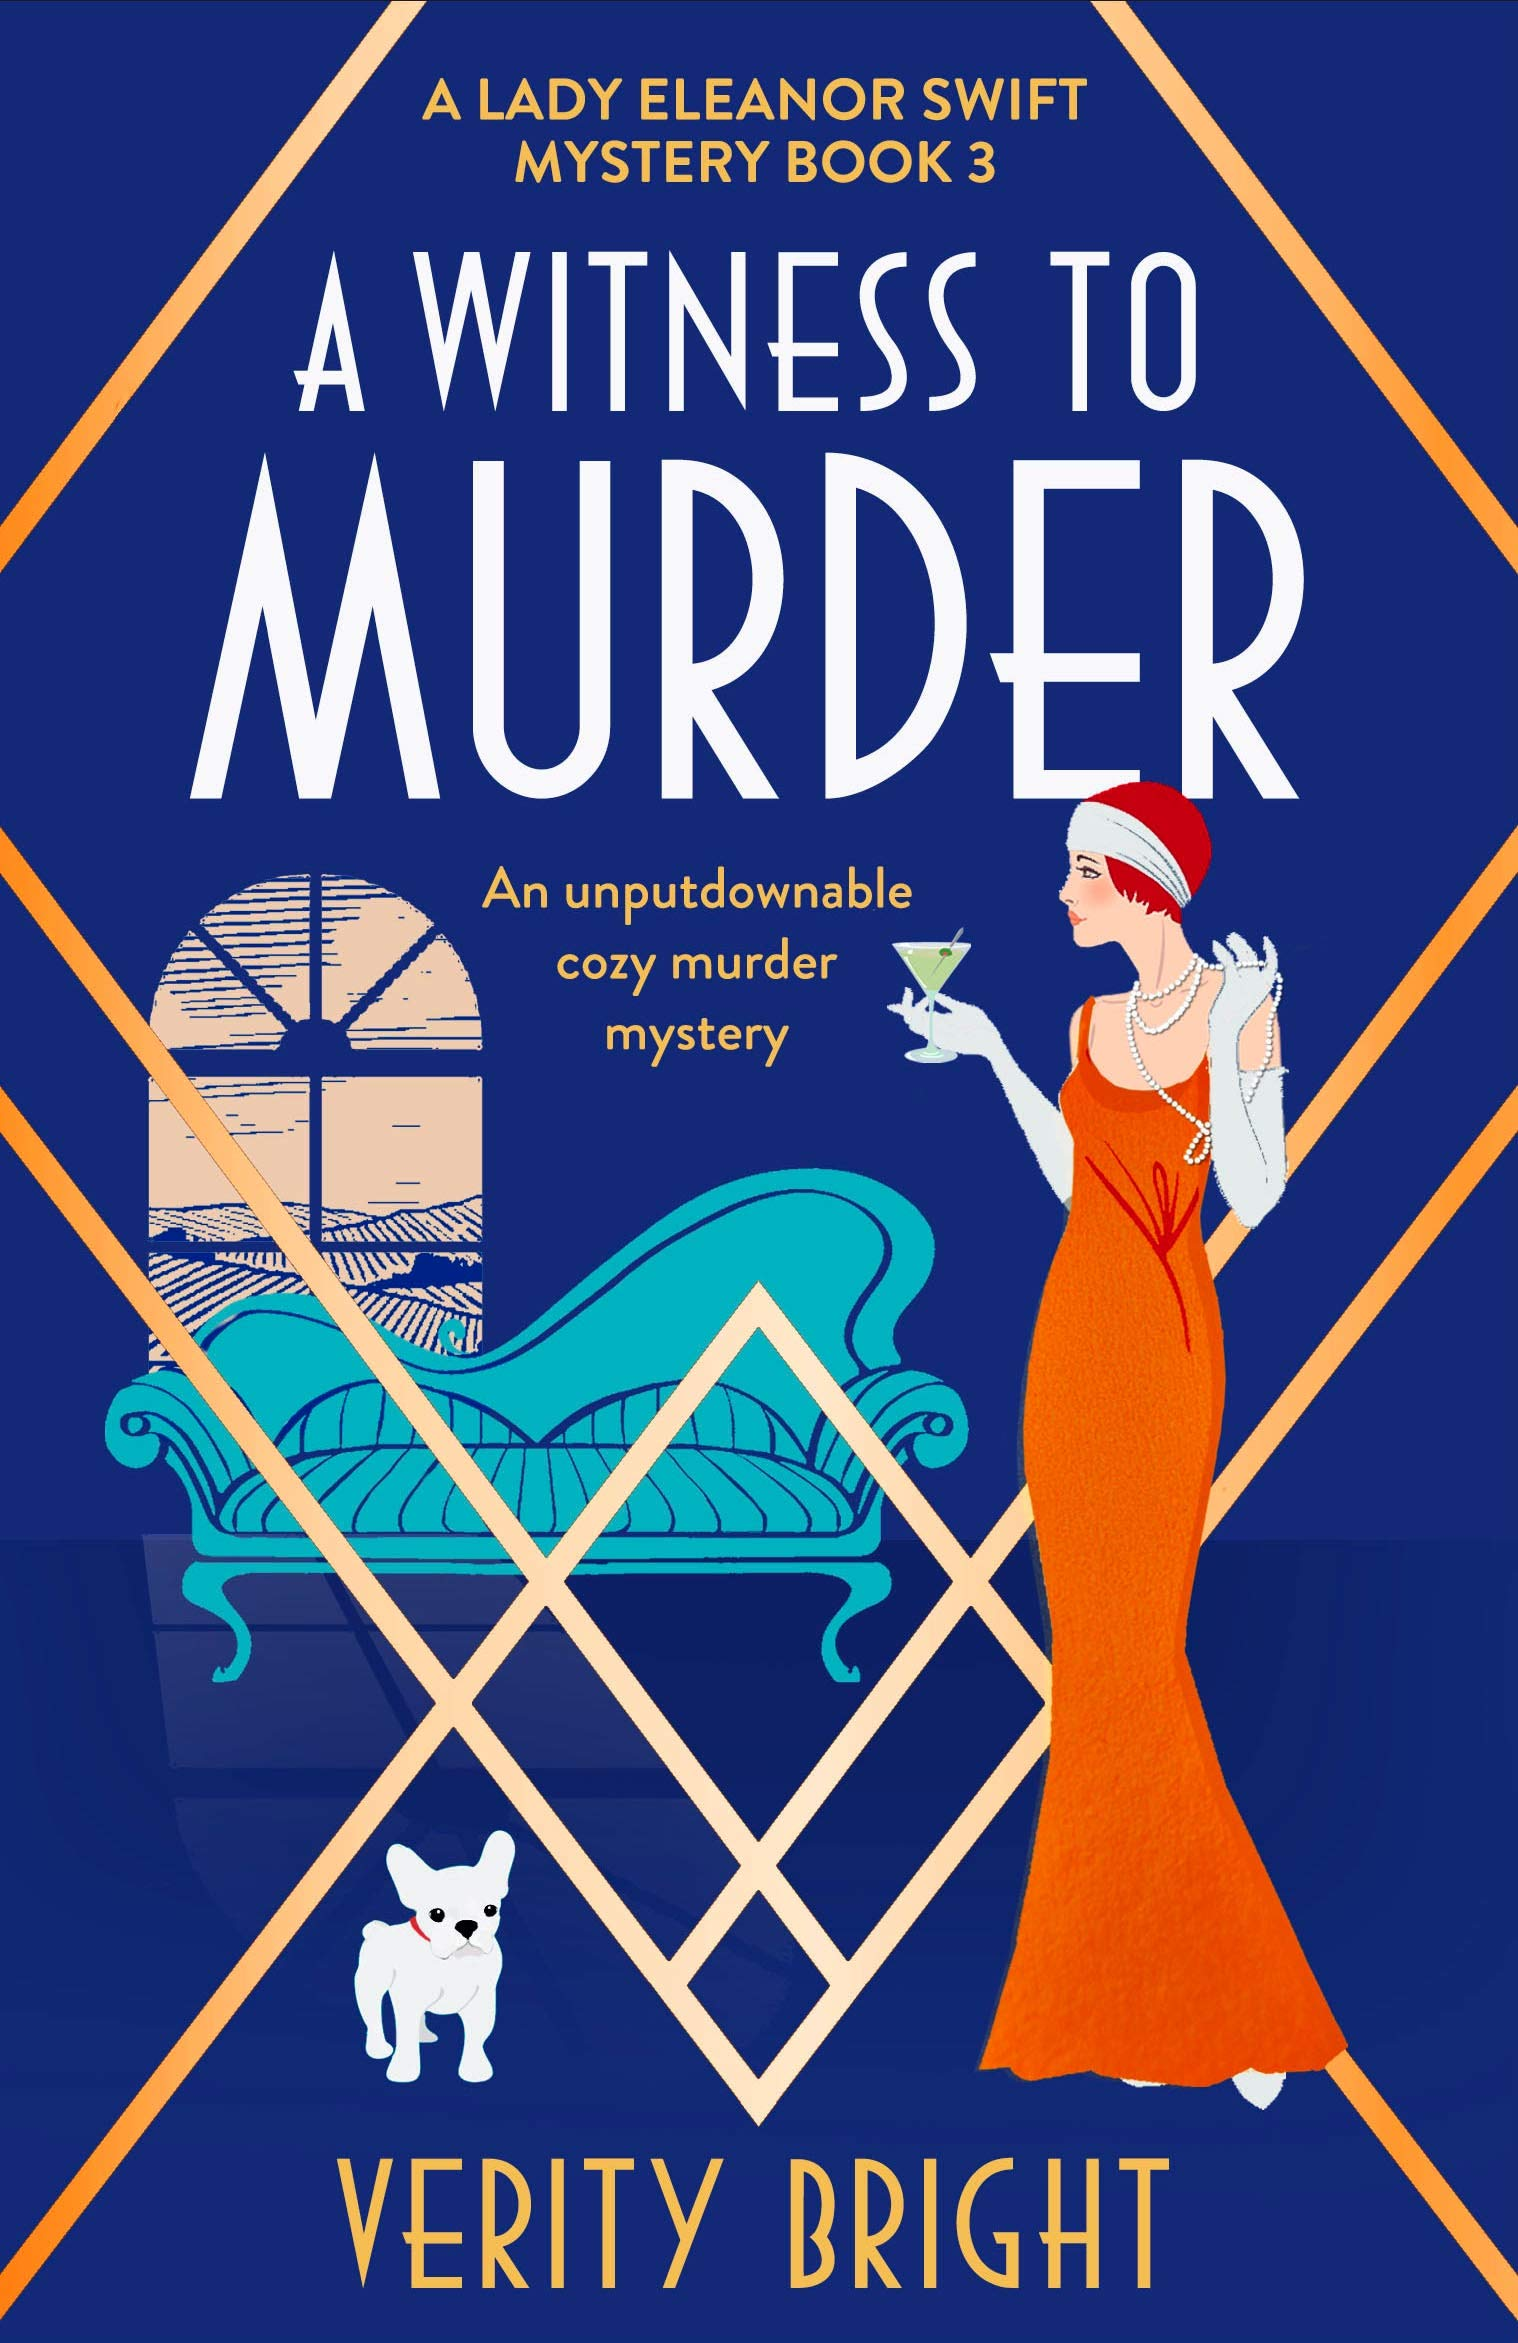 A Witness to Murder (A Lady Eleanor Swift Mystery #3)